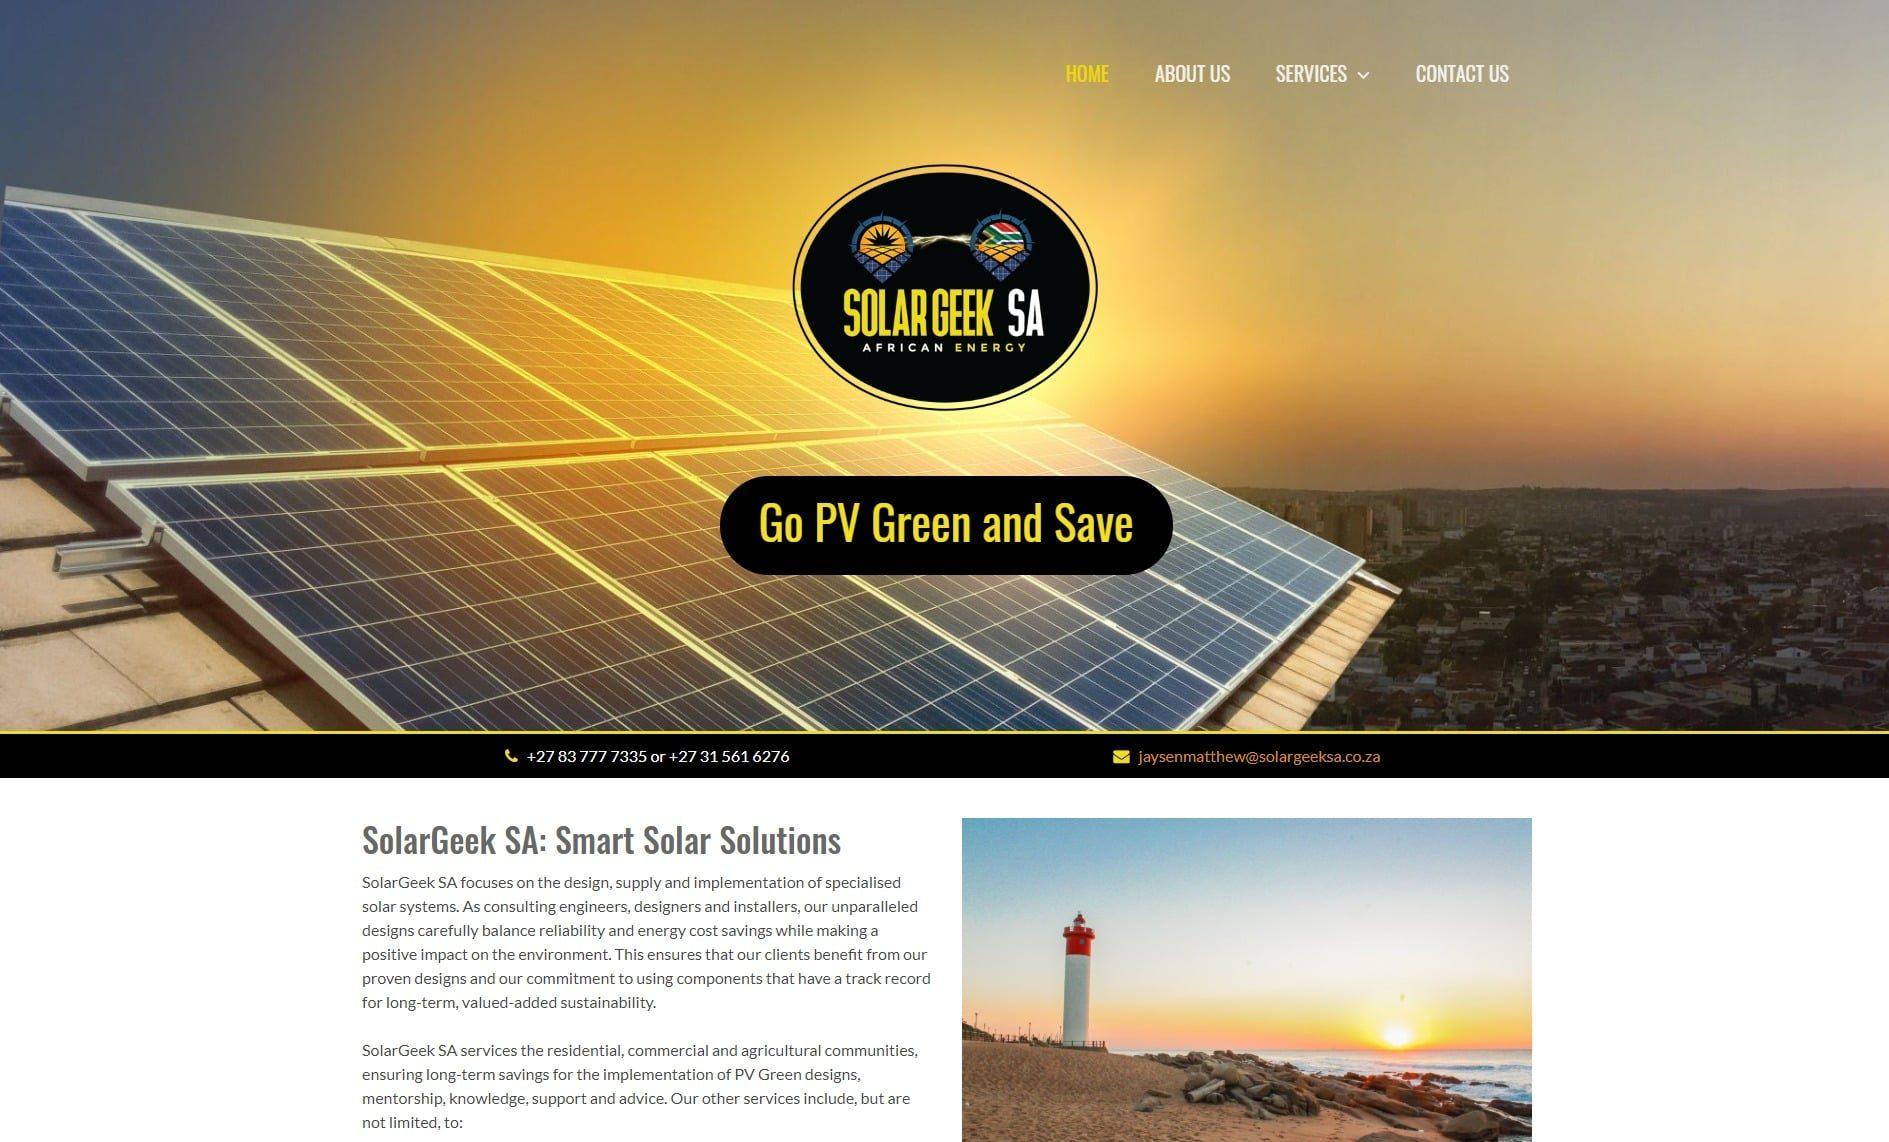 SolarGeek SA